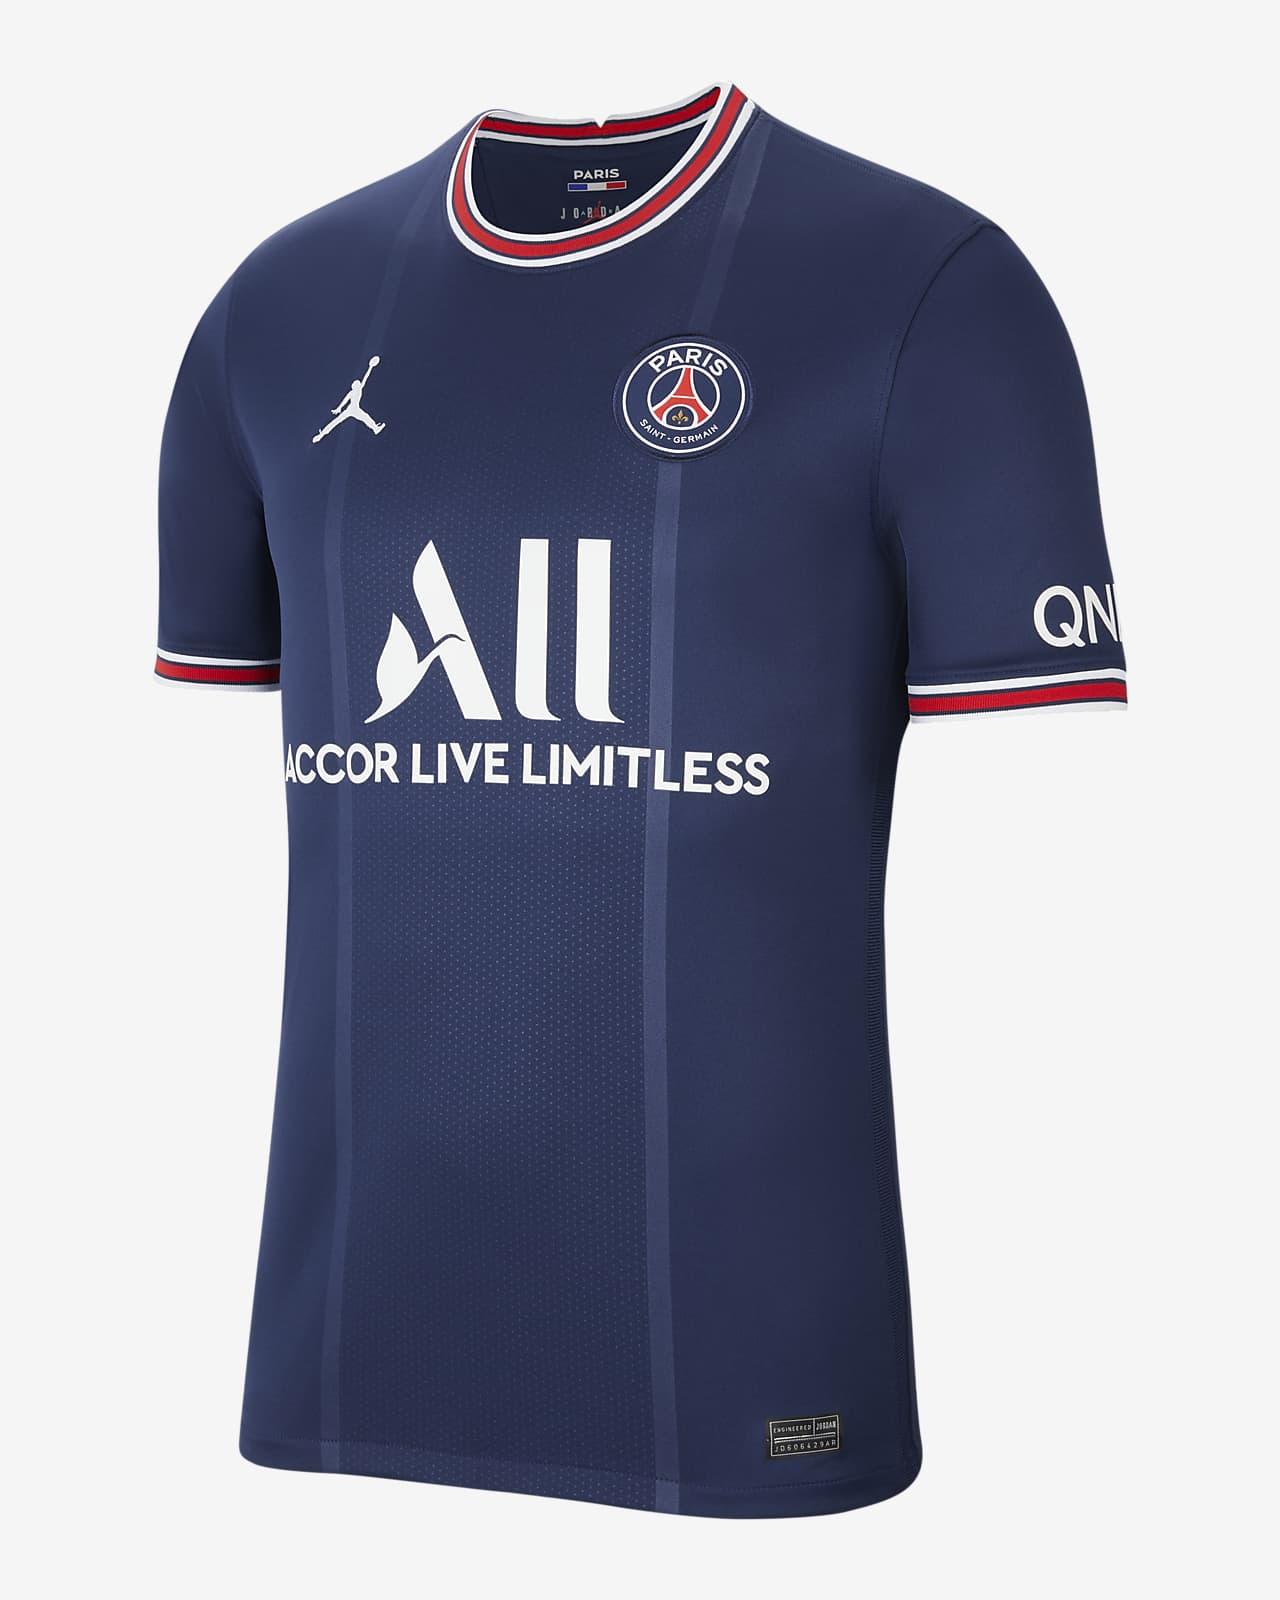 Mbappe Paris Saint-Germain 2021/22 Stadium Home Men's Football Shirt